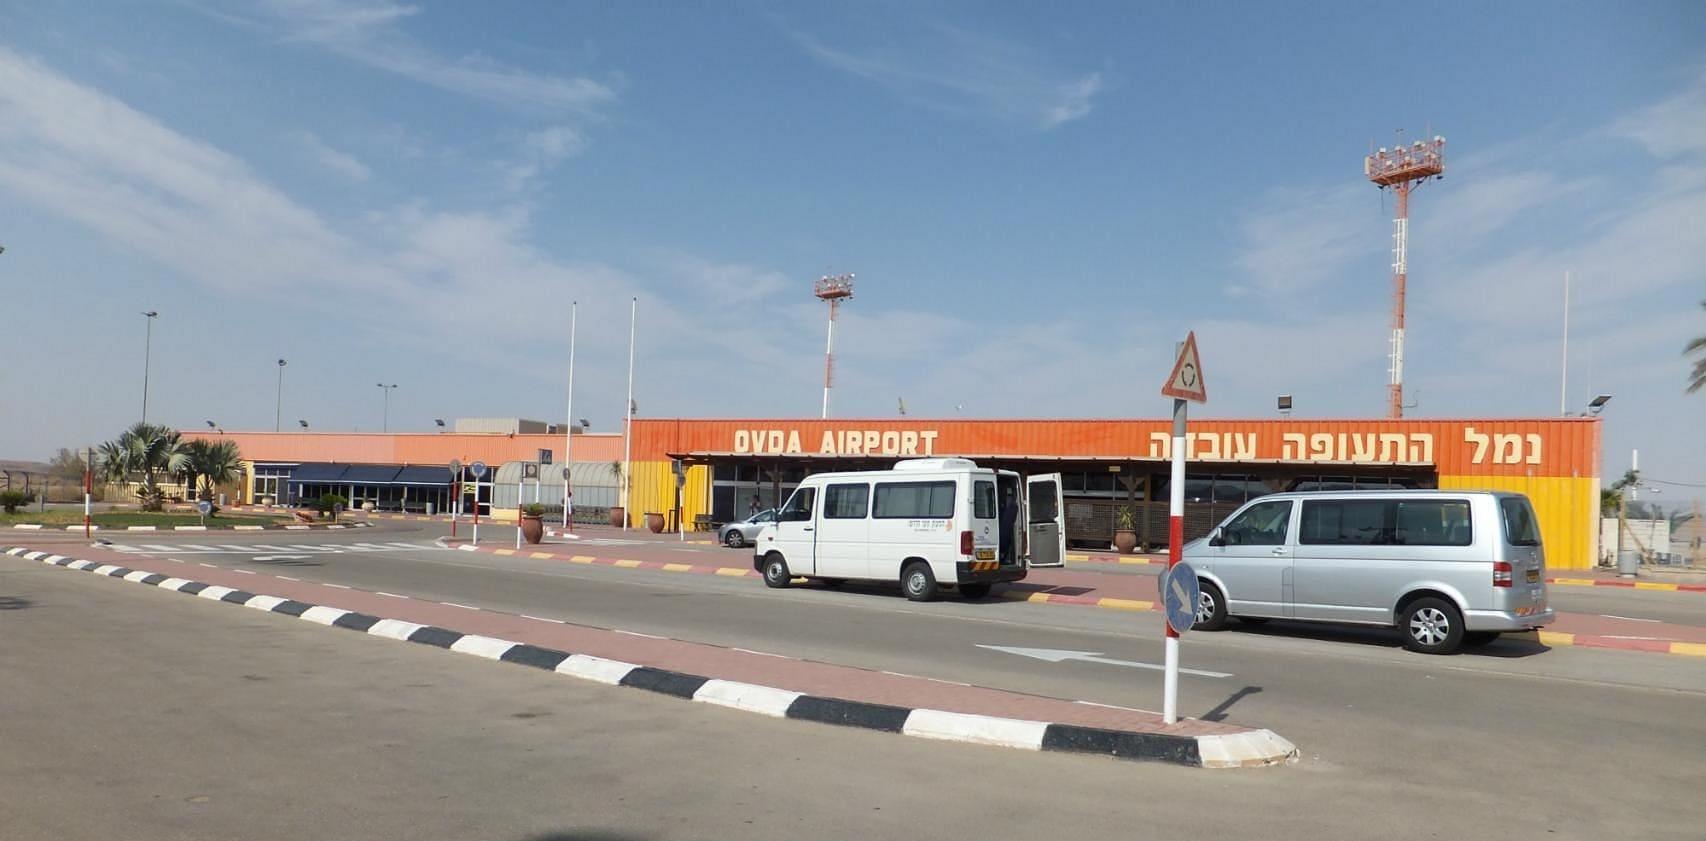 The Ovda Airport